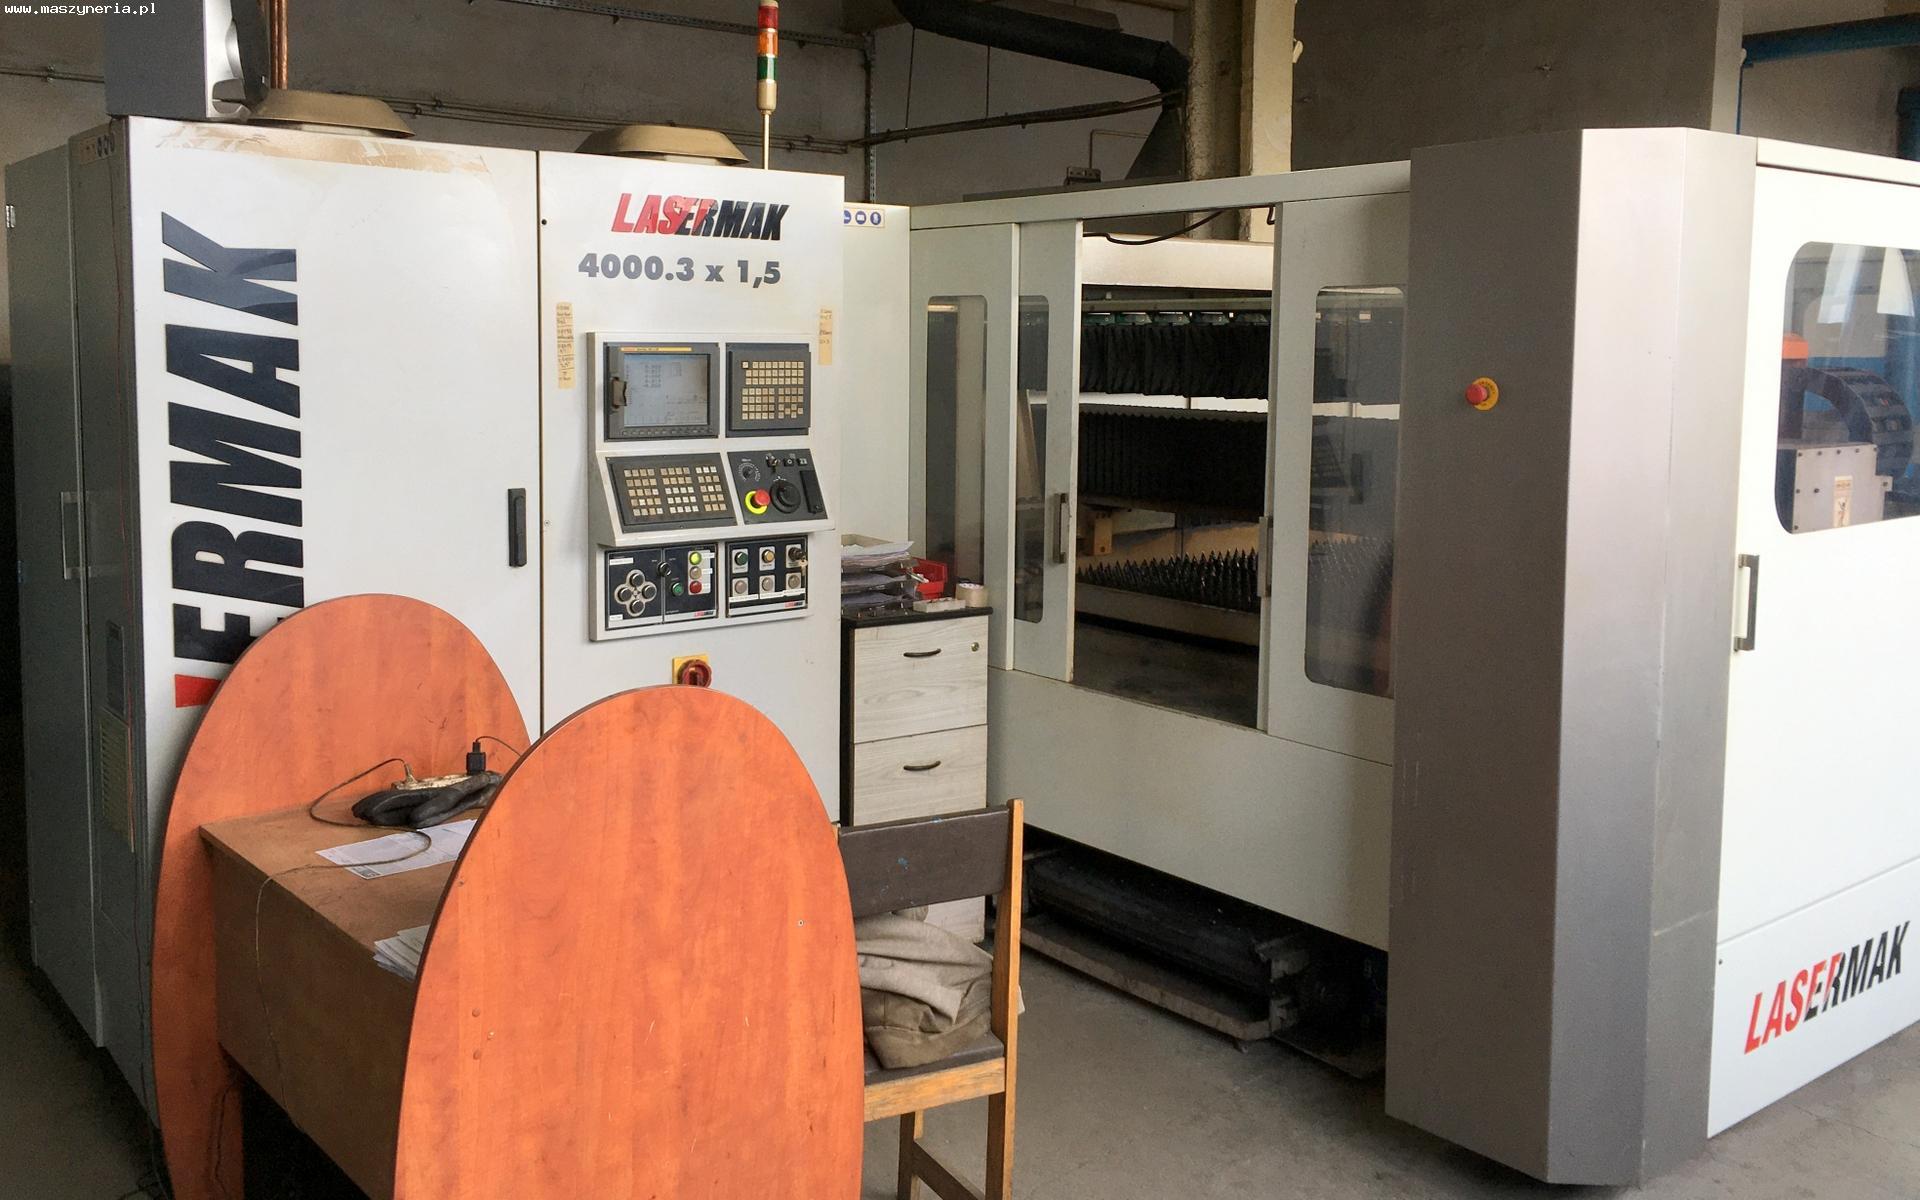 Macchina taglio laser ERMAKSAN LASERMAK 4000,3 x 1,5 in vendita - foto 1